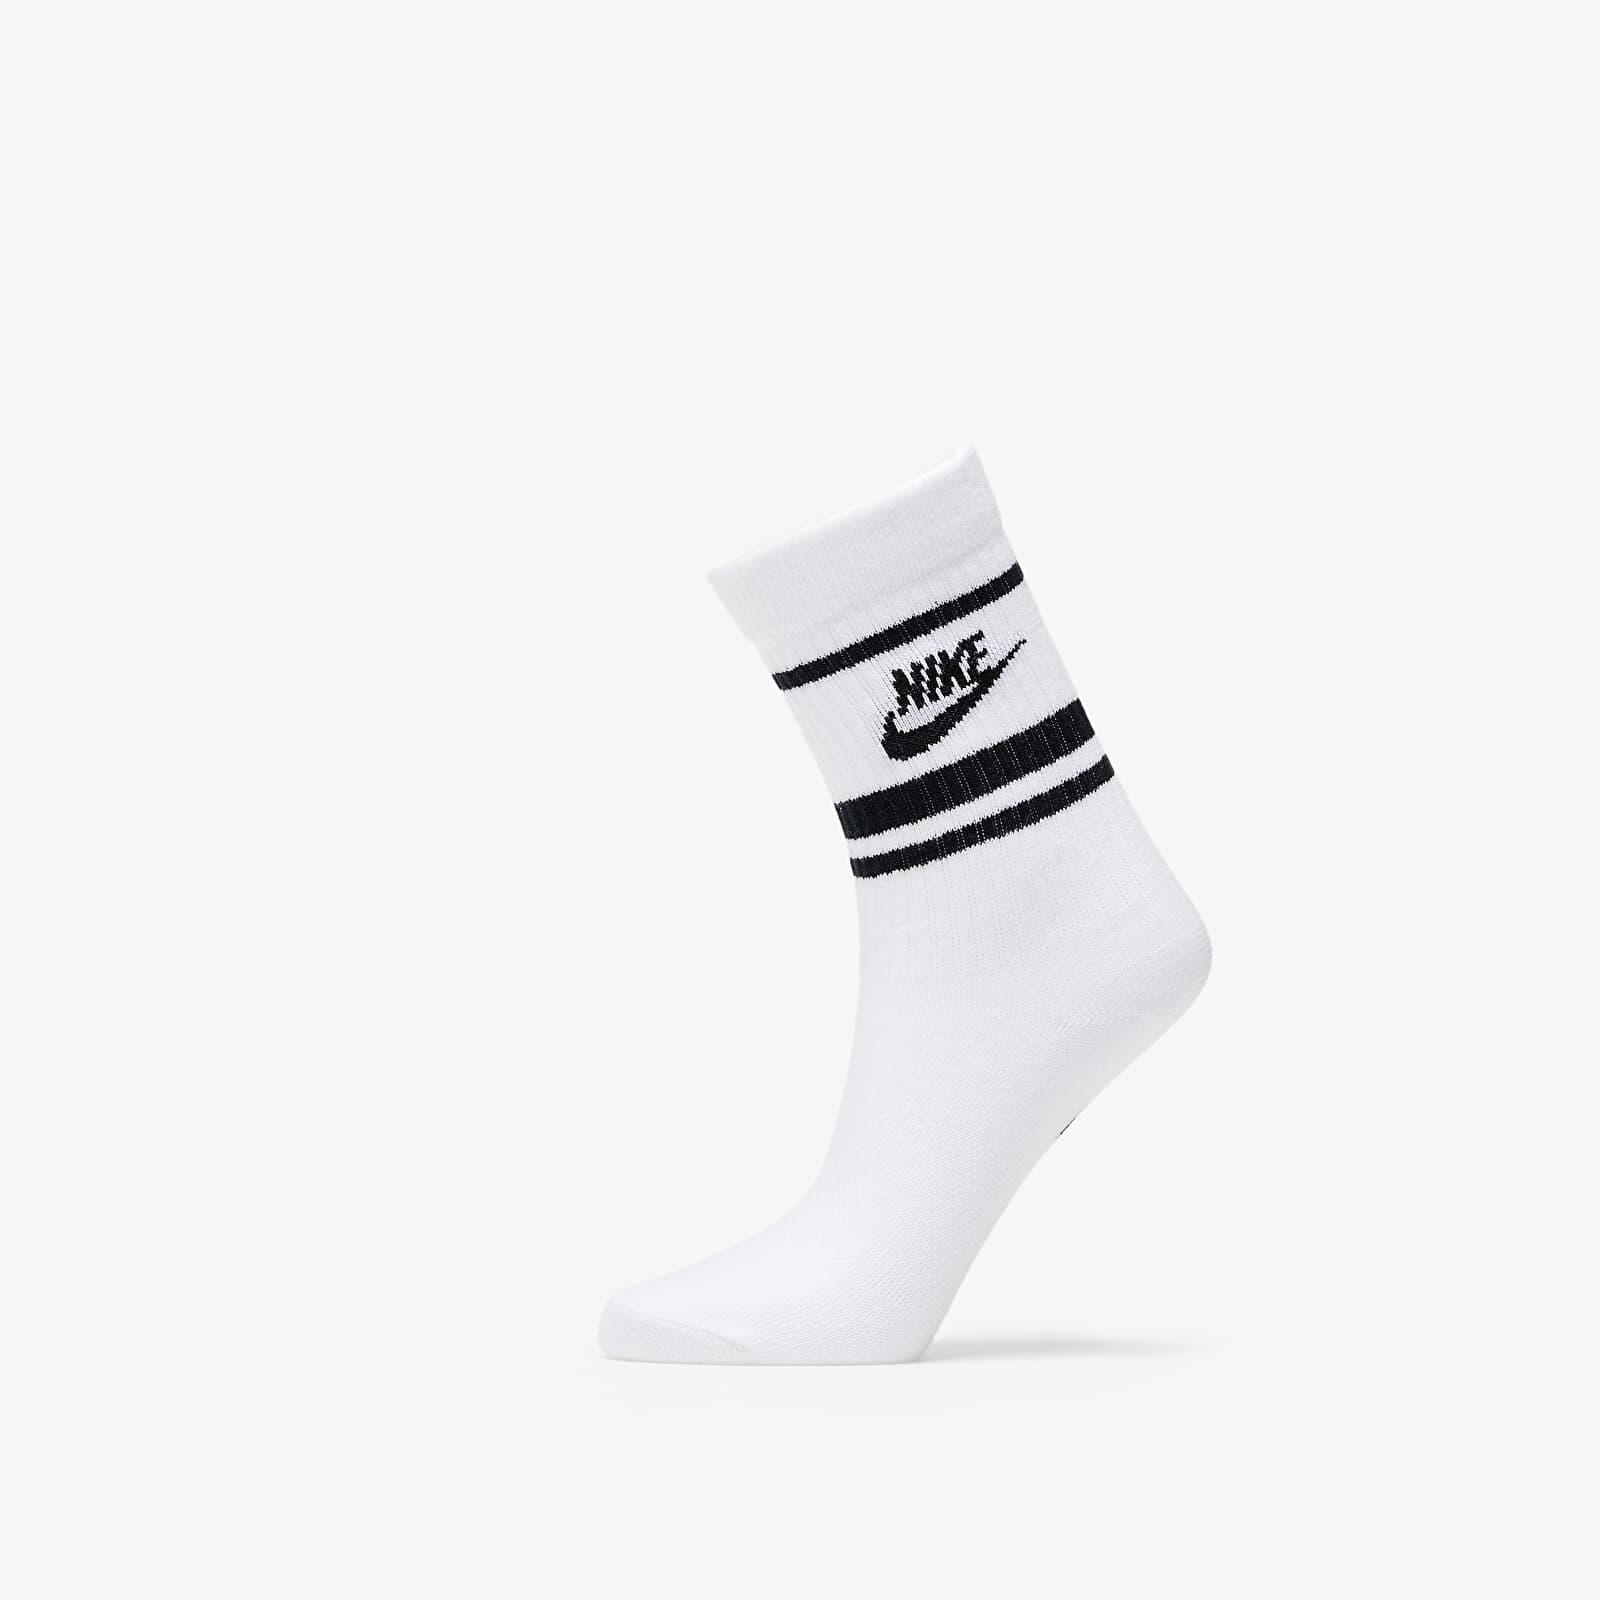 Nike Sportswear Essential Crew Socks (3 Pairs) White/ Black/ Black M